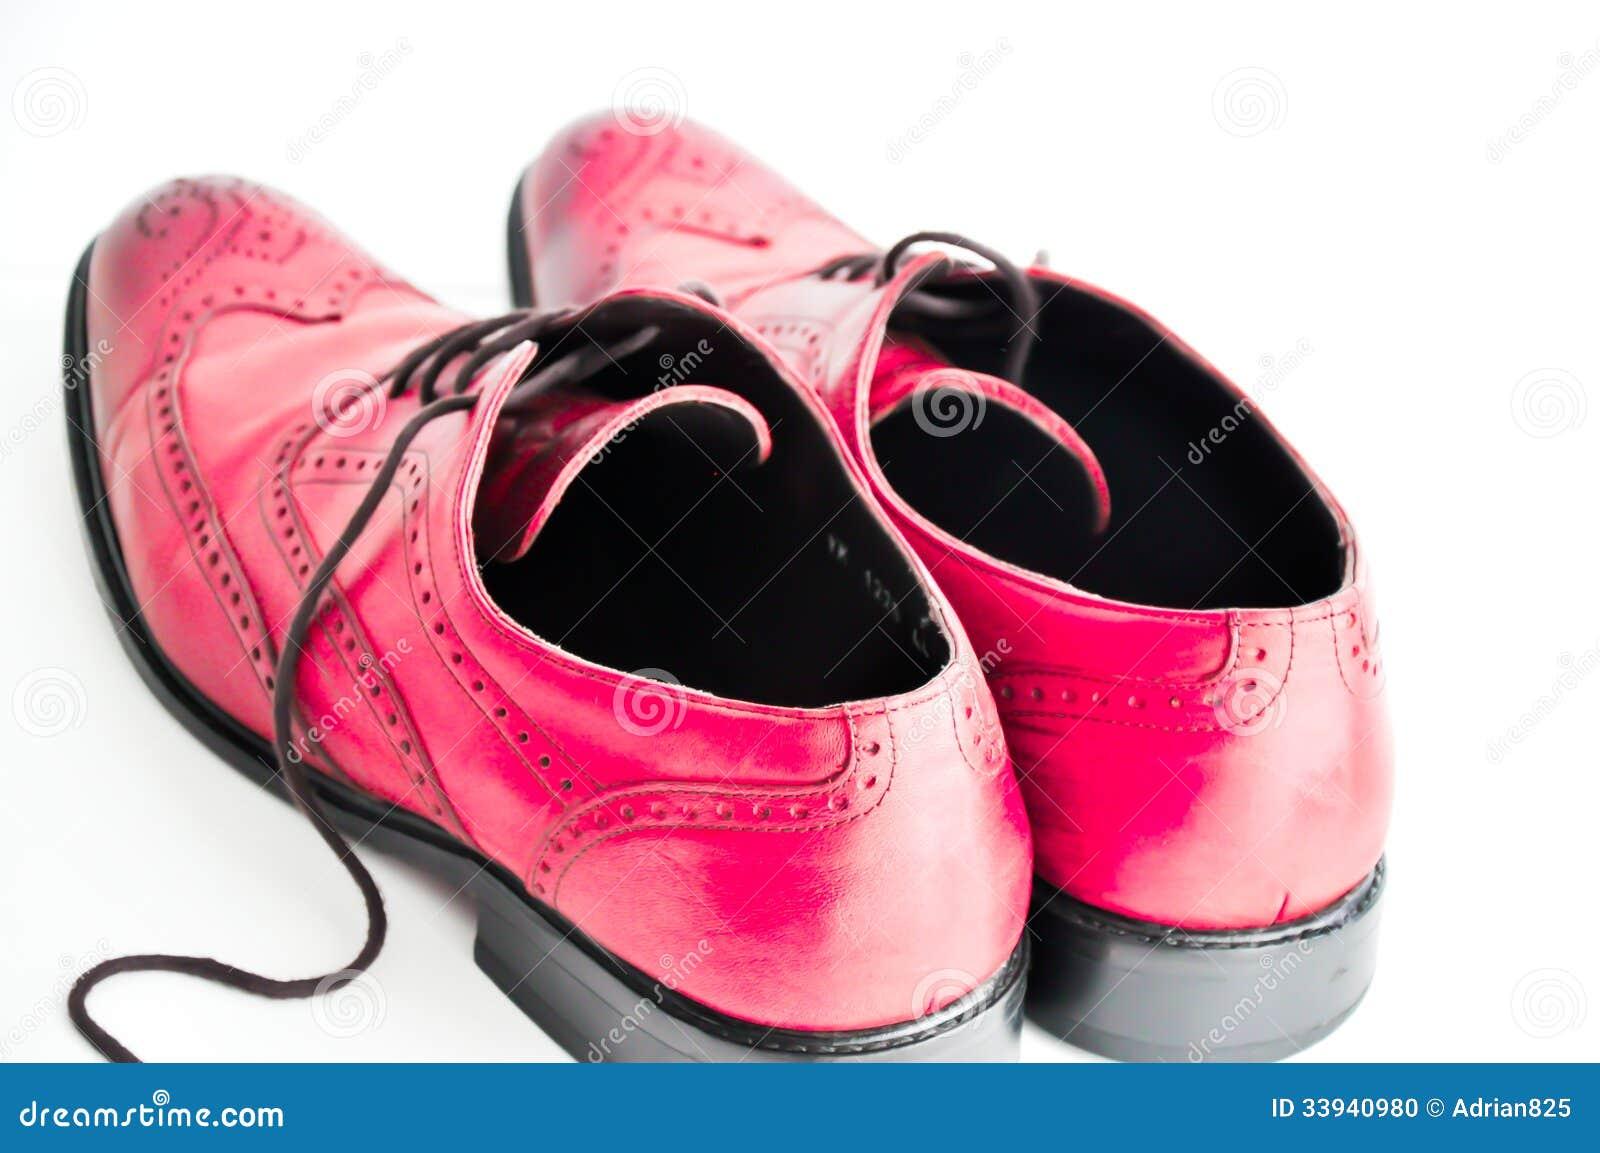 Zapatos rosas para hombre j2bkOThVa